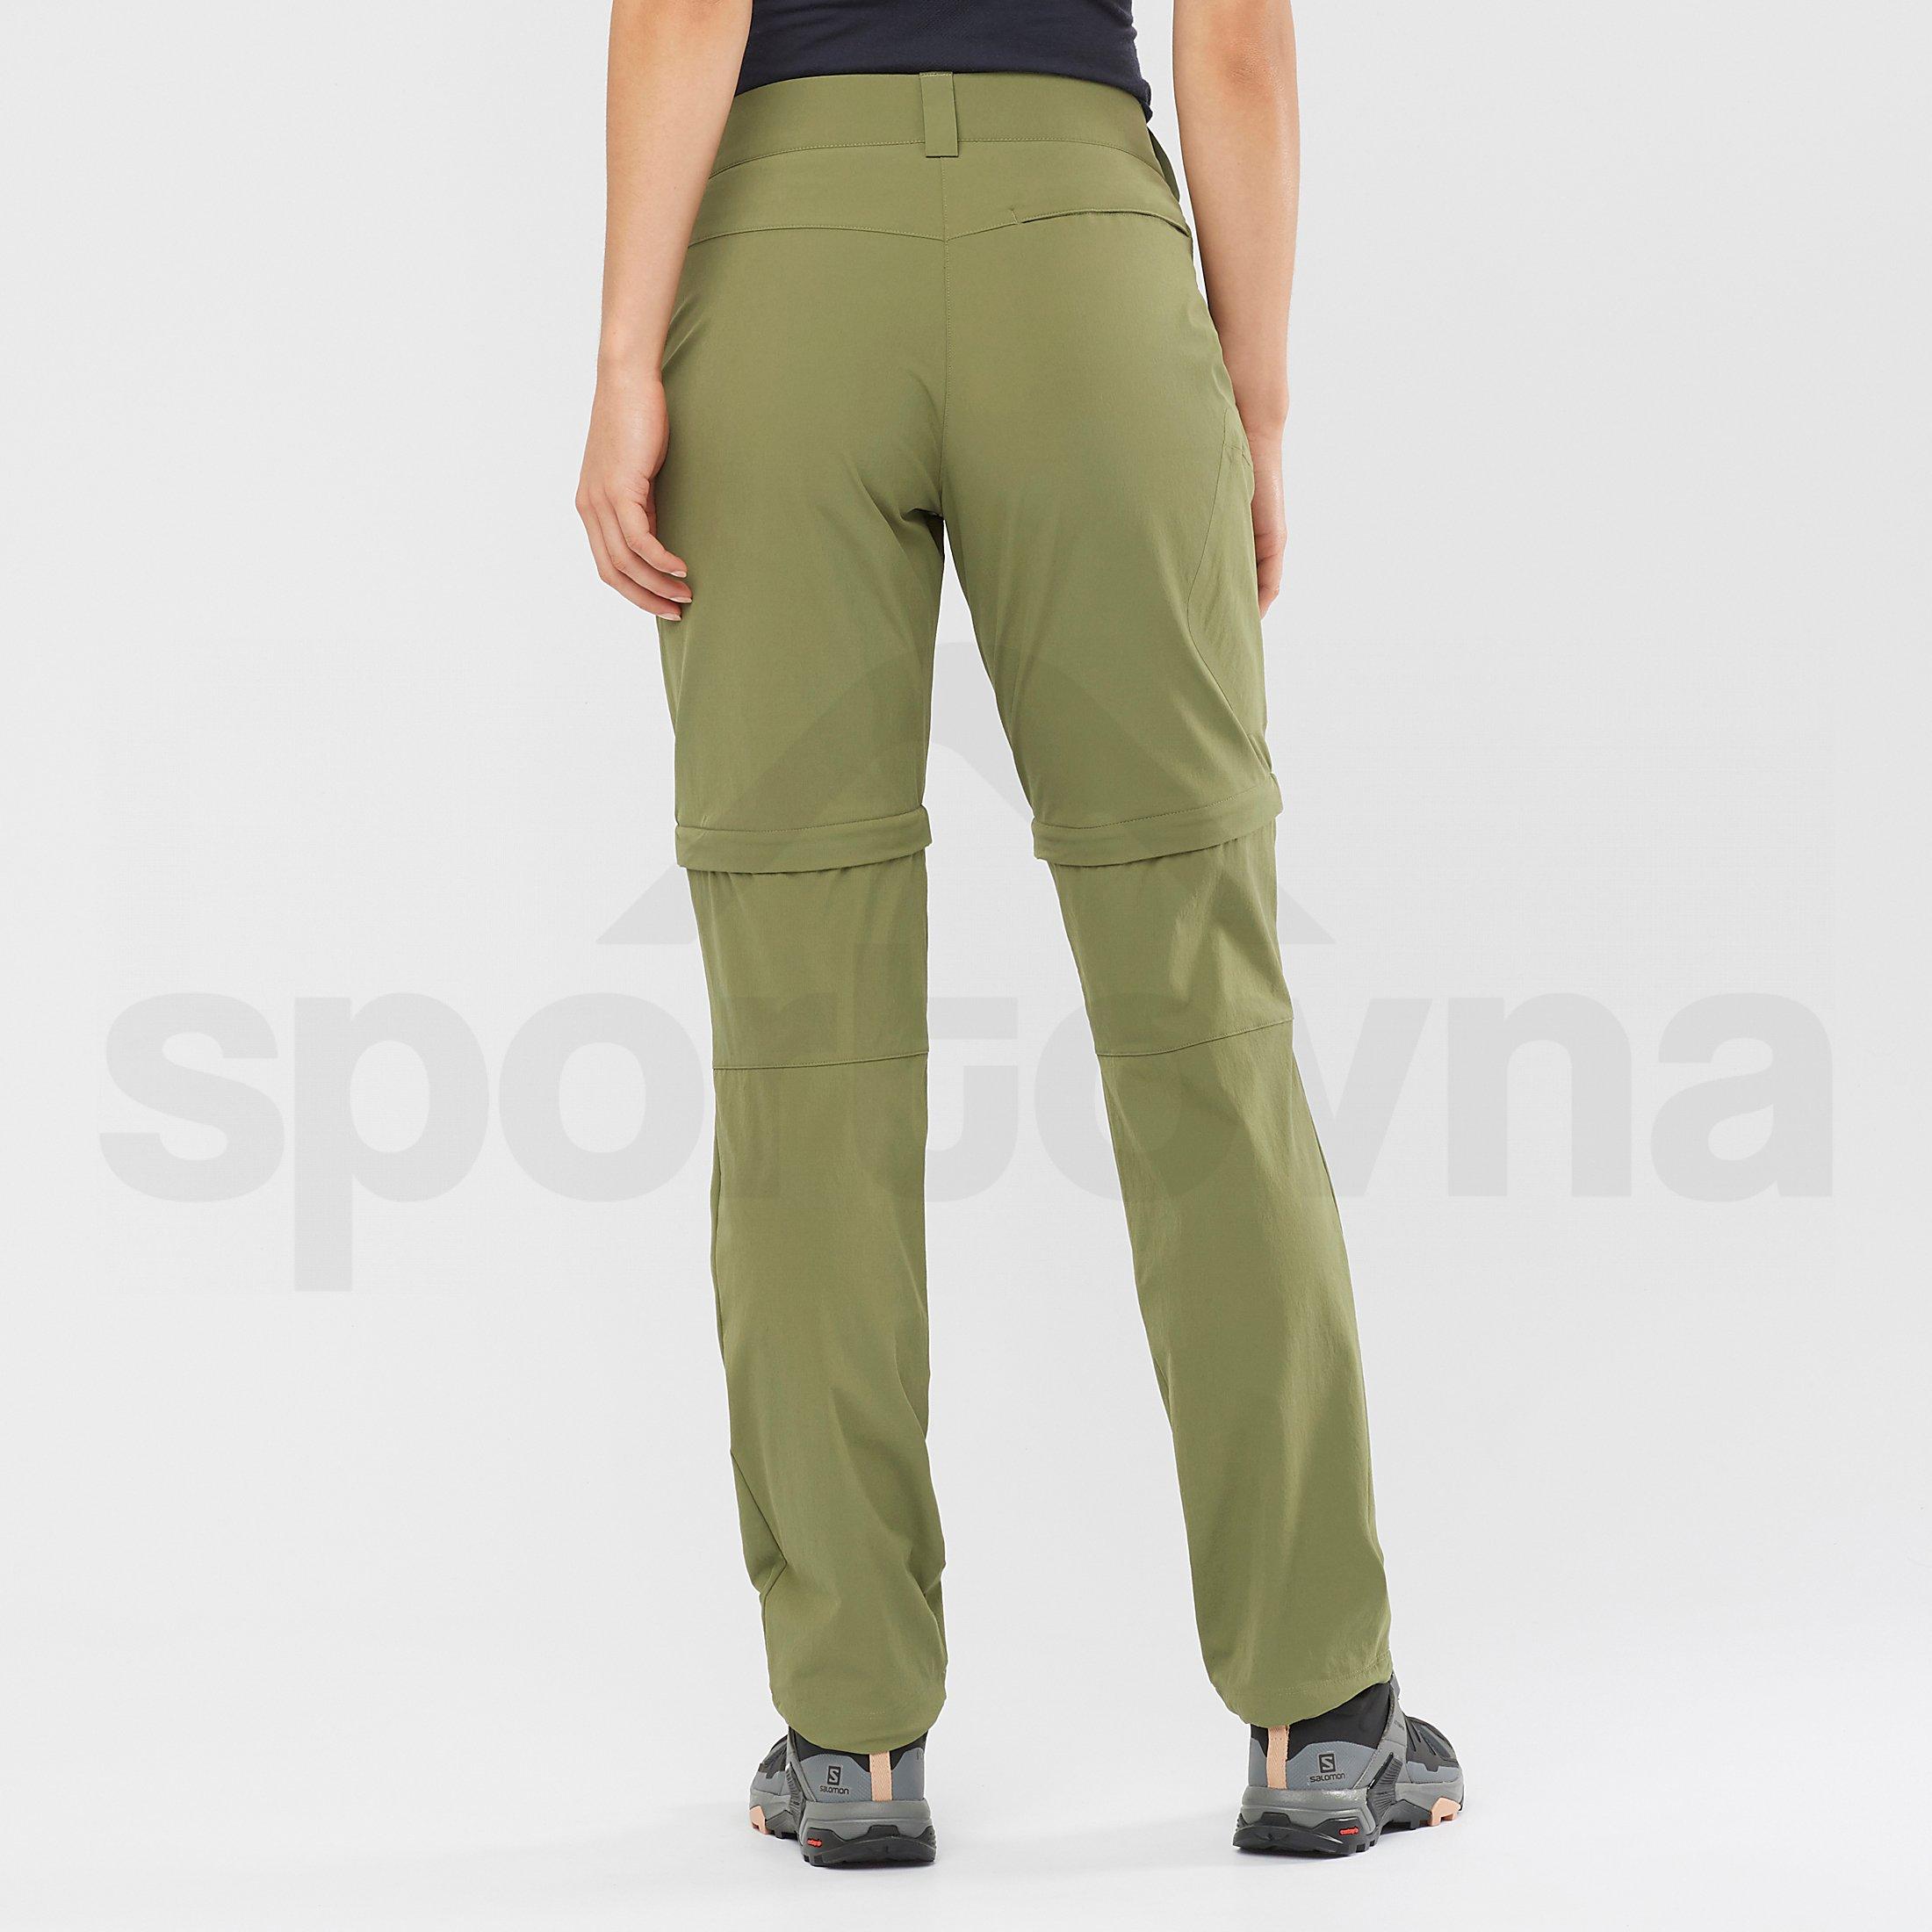 Kalhoty Salomon Wayfarer Zip Off Pant W - zelená